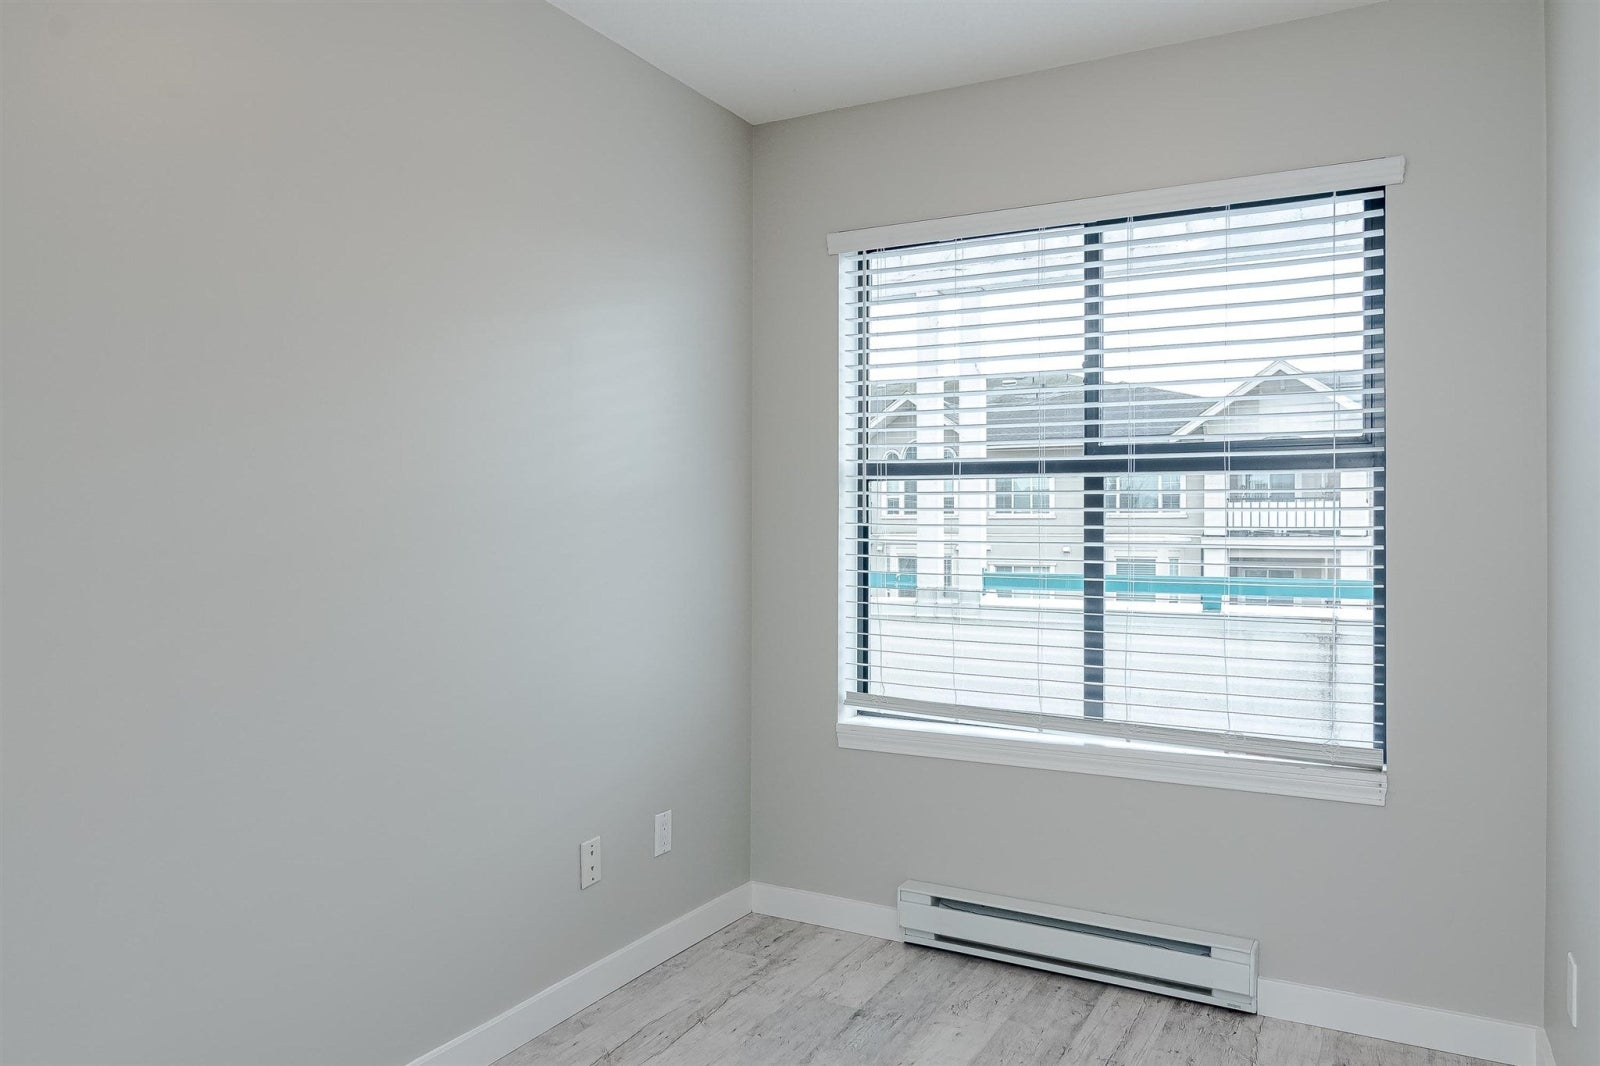 405 20268 54 AVENUE - Langley City Apartment/Condo for sale, 2 Bedrooms (R2604183) #12